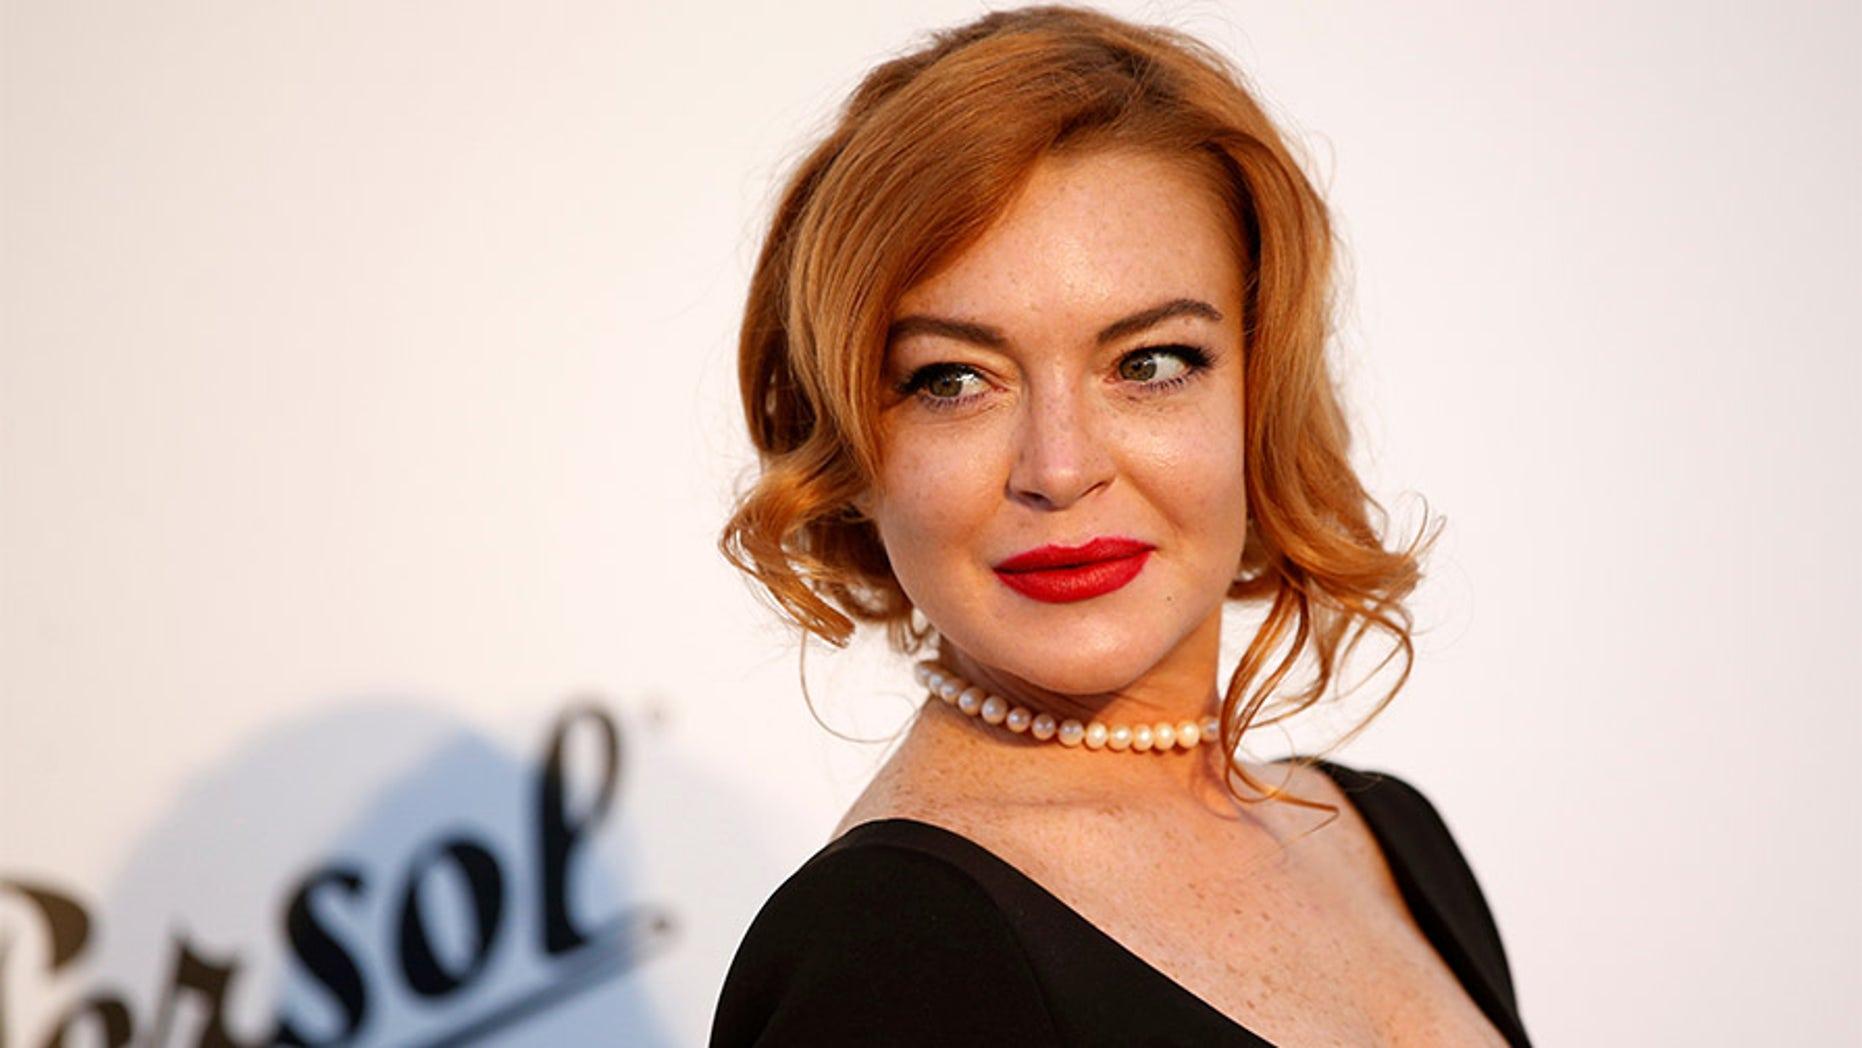 Lindsay Lohan Demands That Her Beach House Staff Wear Same Shoes